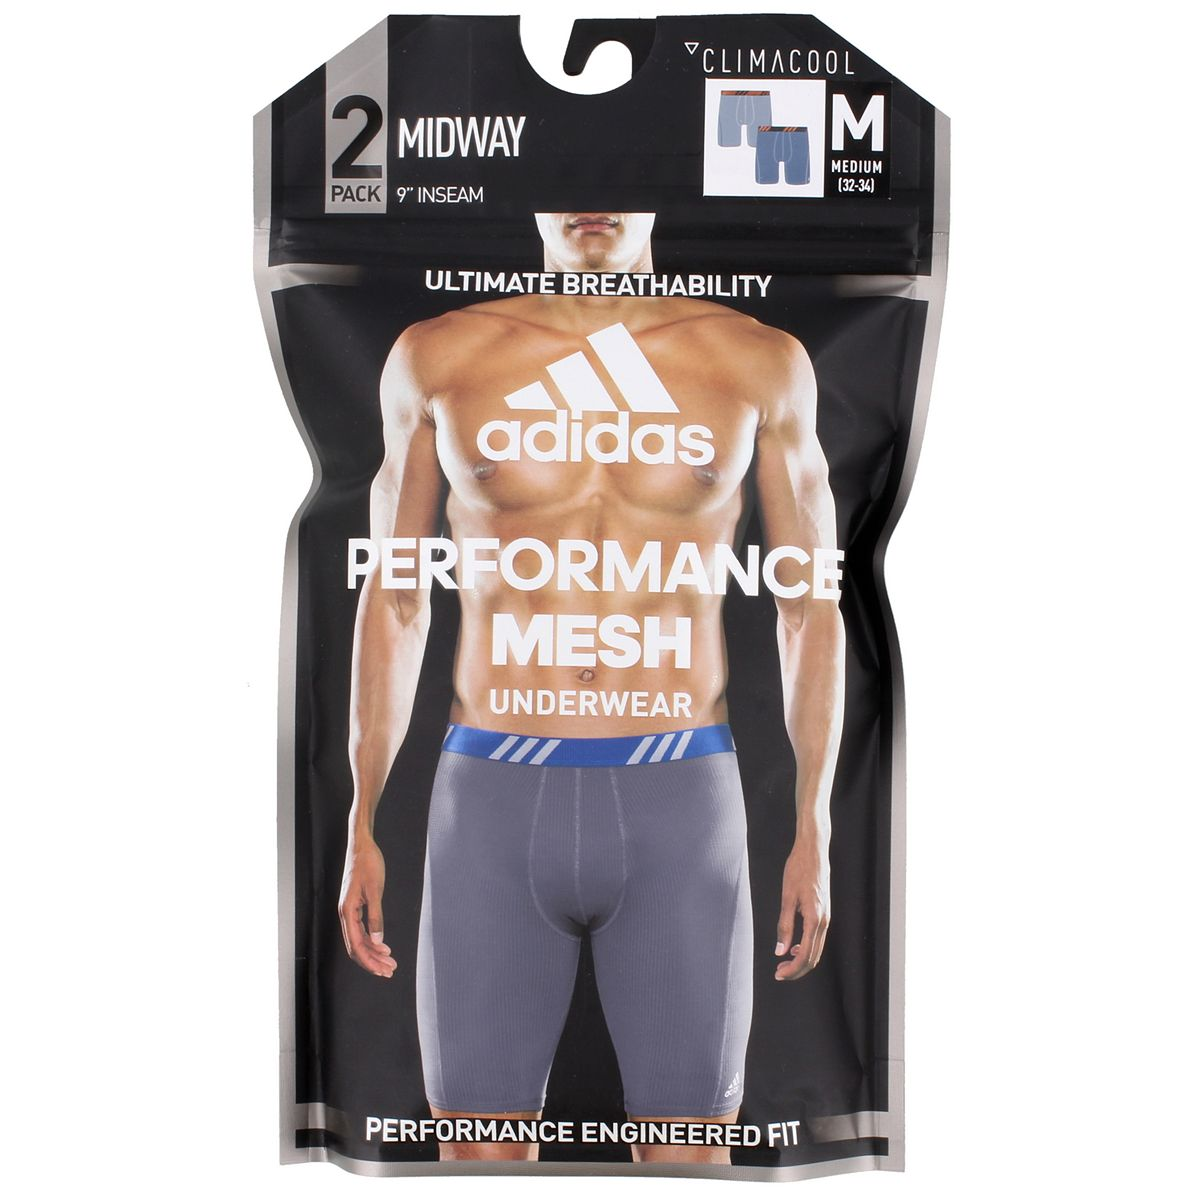 Men's adidas Sport Performance Mesh 2-Pack Midway Underwear Gray Solar Orange Onix AK0Bw